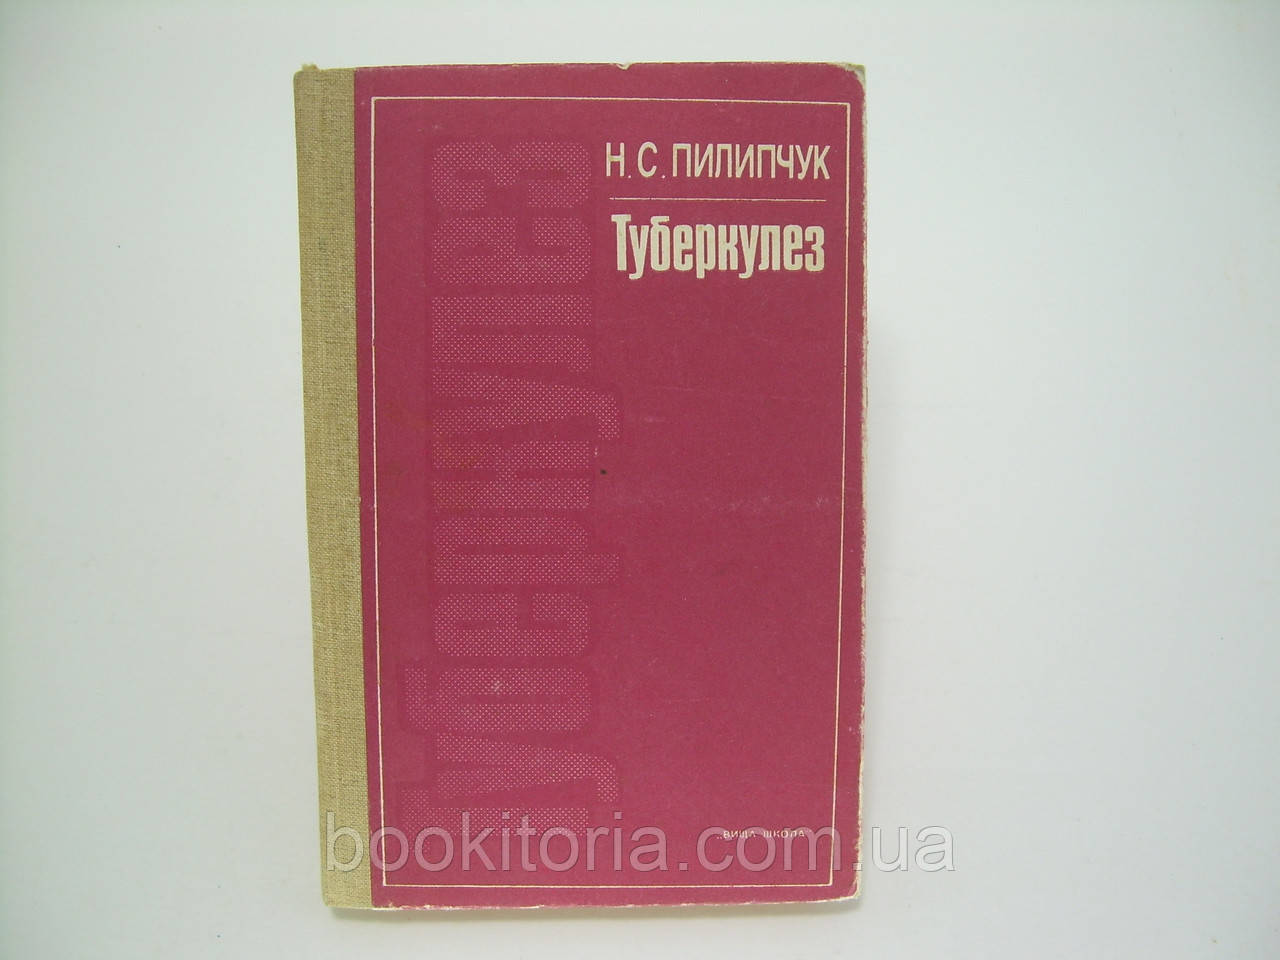 Пилипчук Н.С. Туберкулез (б/у).